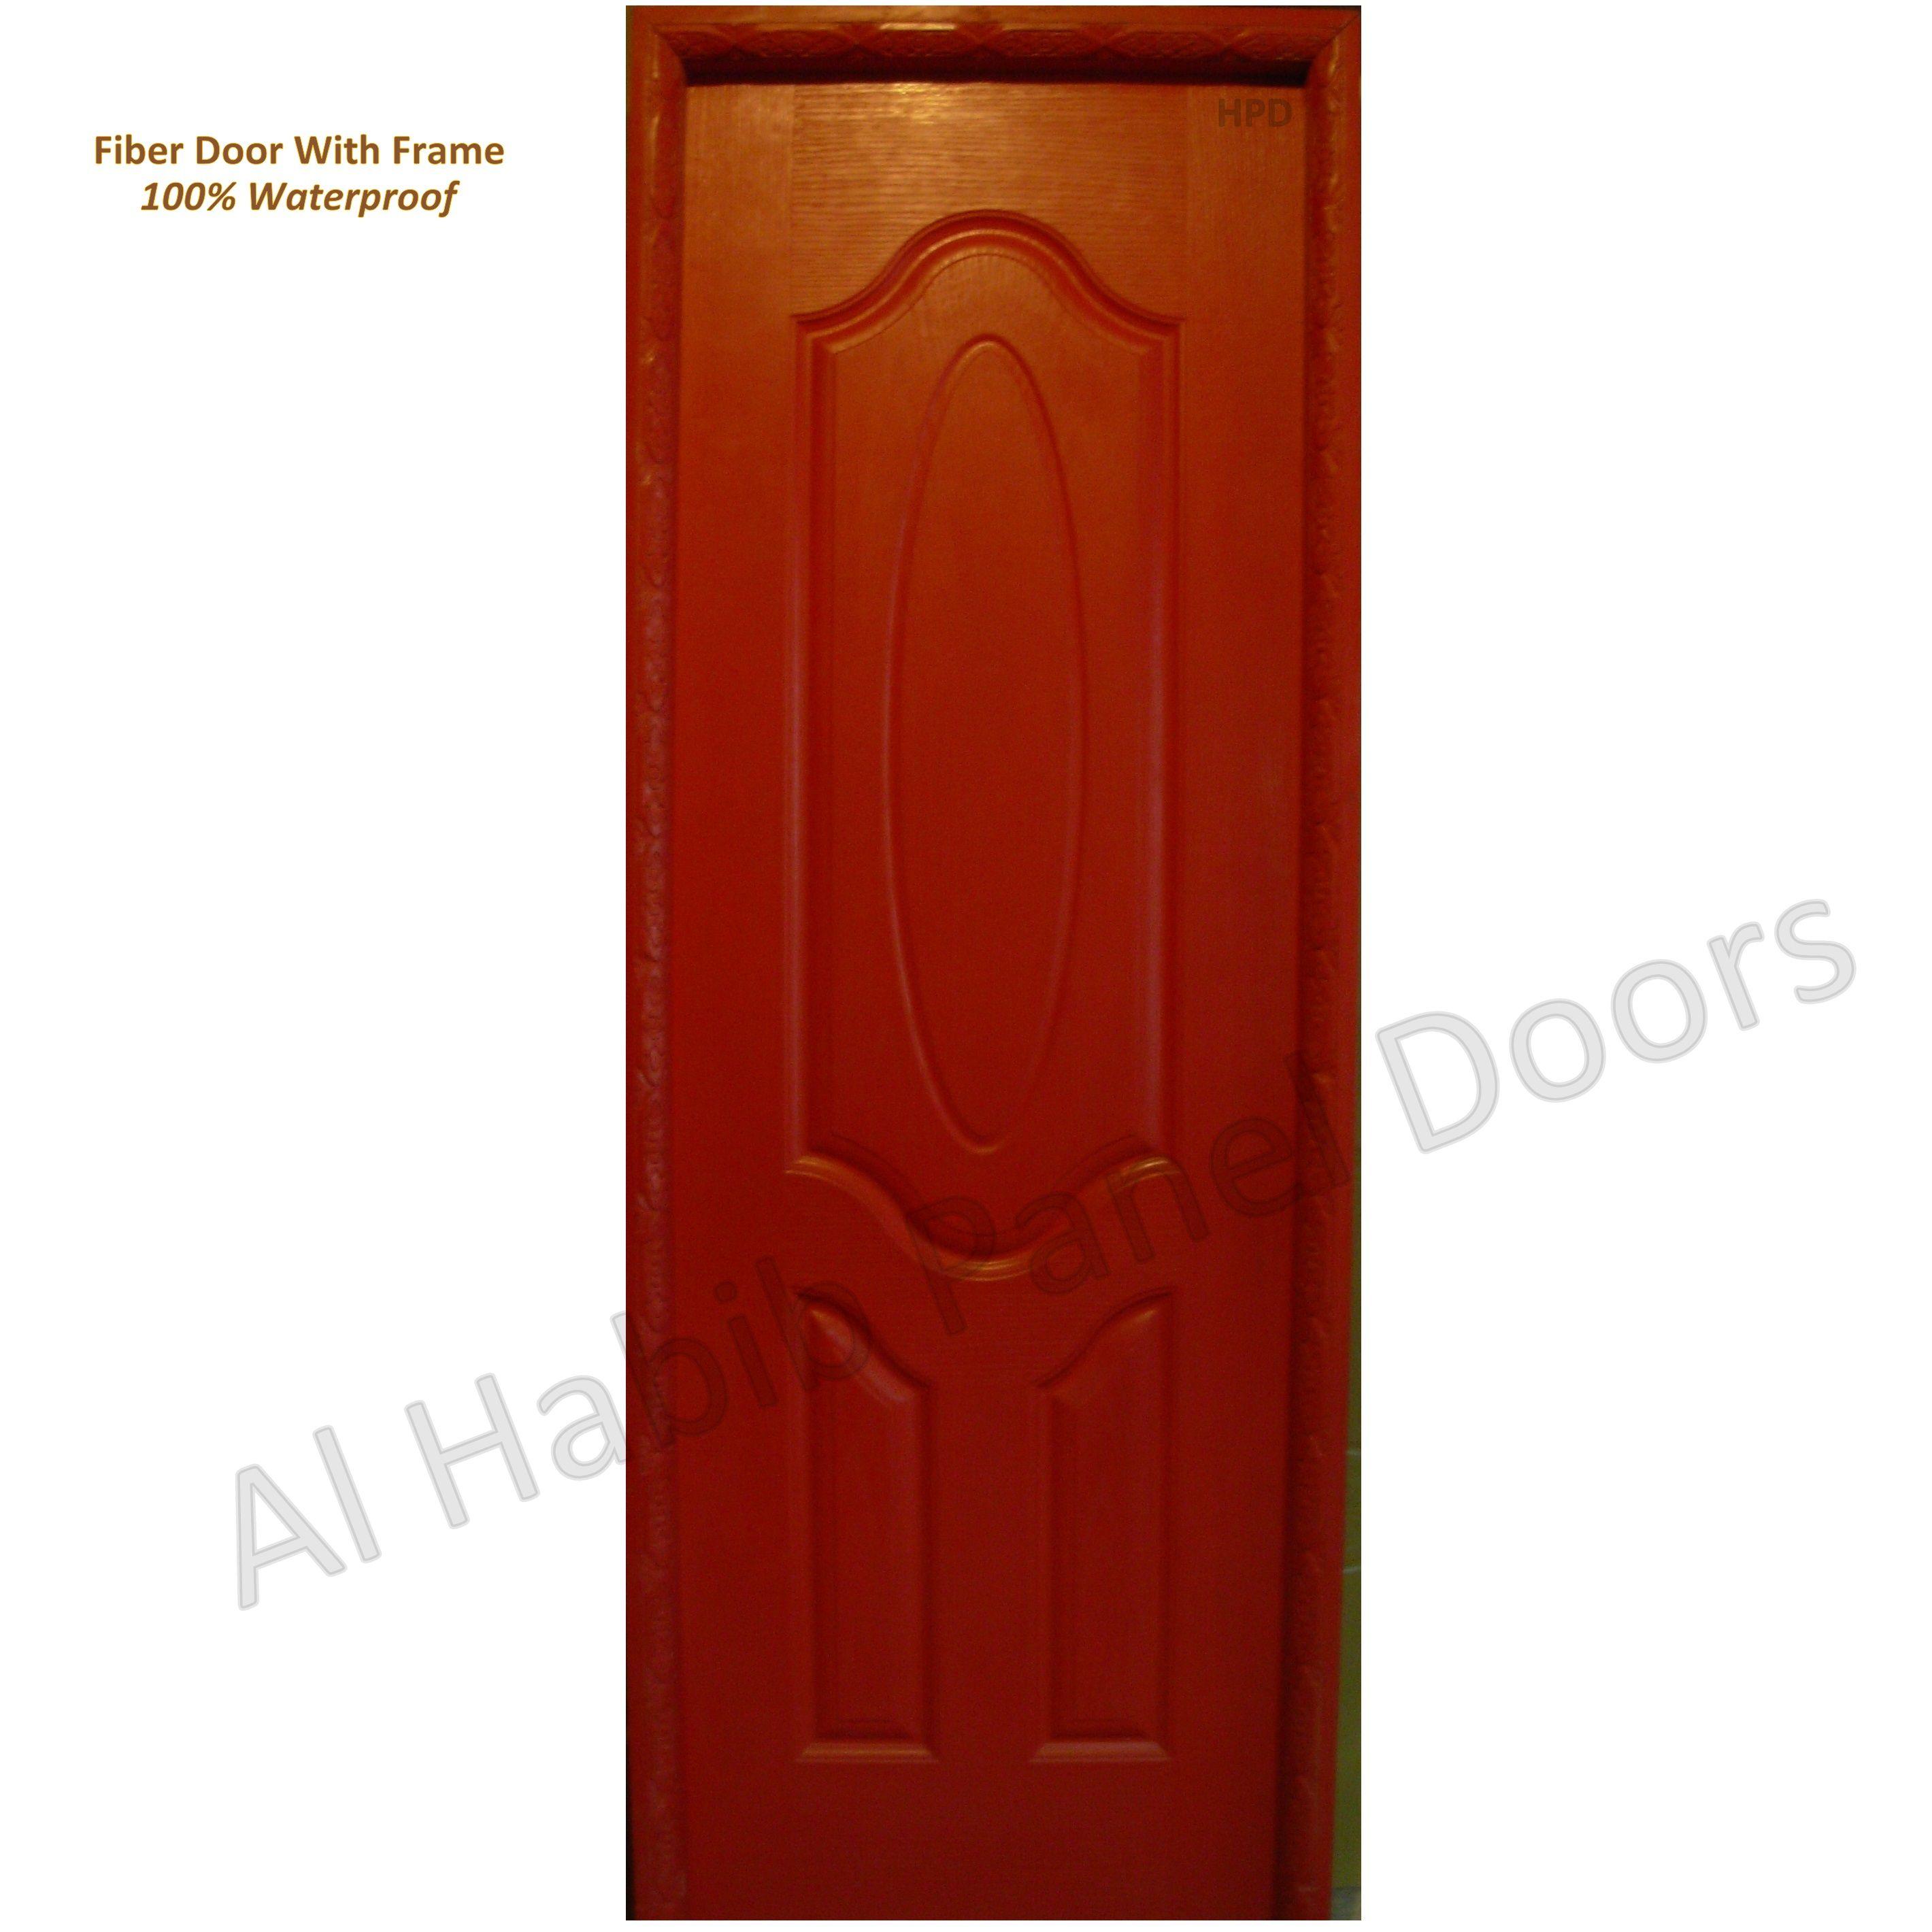 Fiber Door With Fiber Frame Hpd469 - Fiber Panel Doors - Al Habib Panel Doors  sc 1 st  Pinterest & Fiber Door With Fiber Frame Hpd469 - Fiber Panel Doors - Al Habib ...